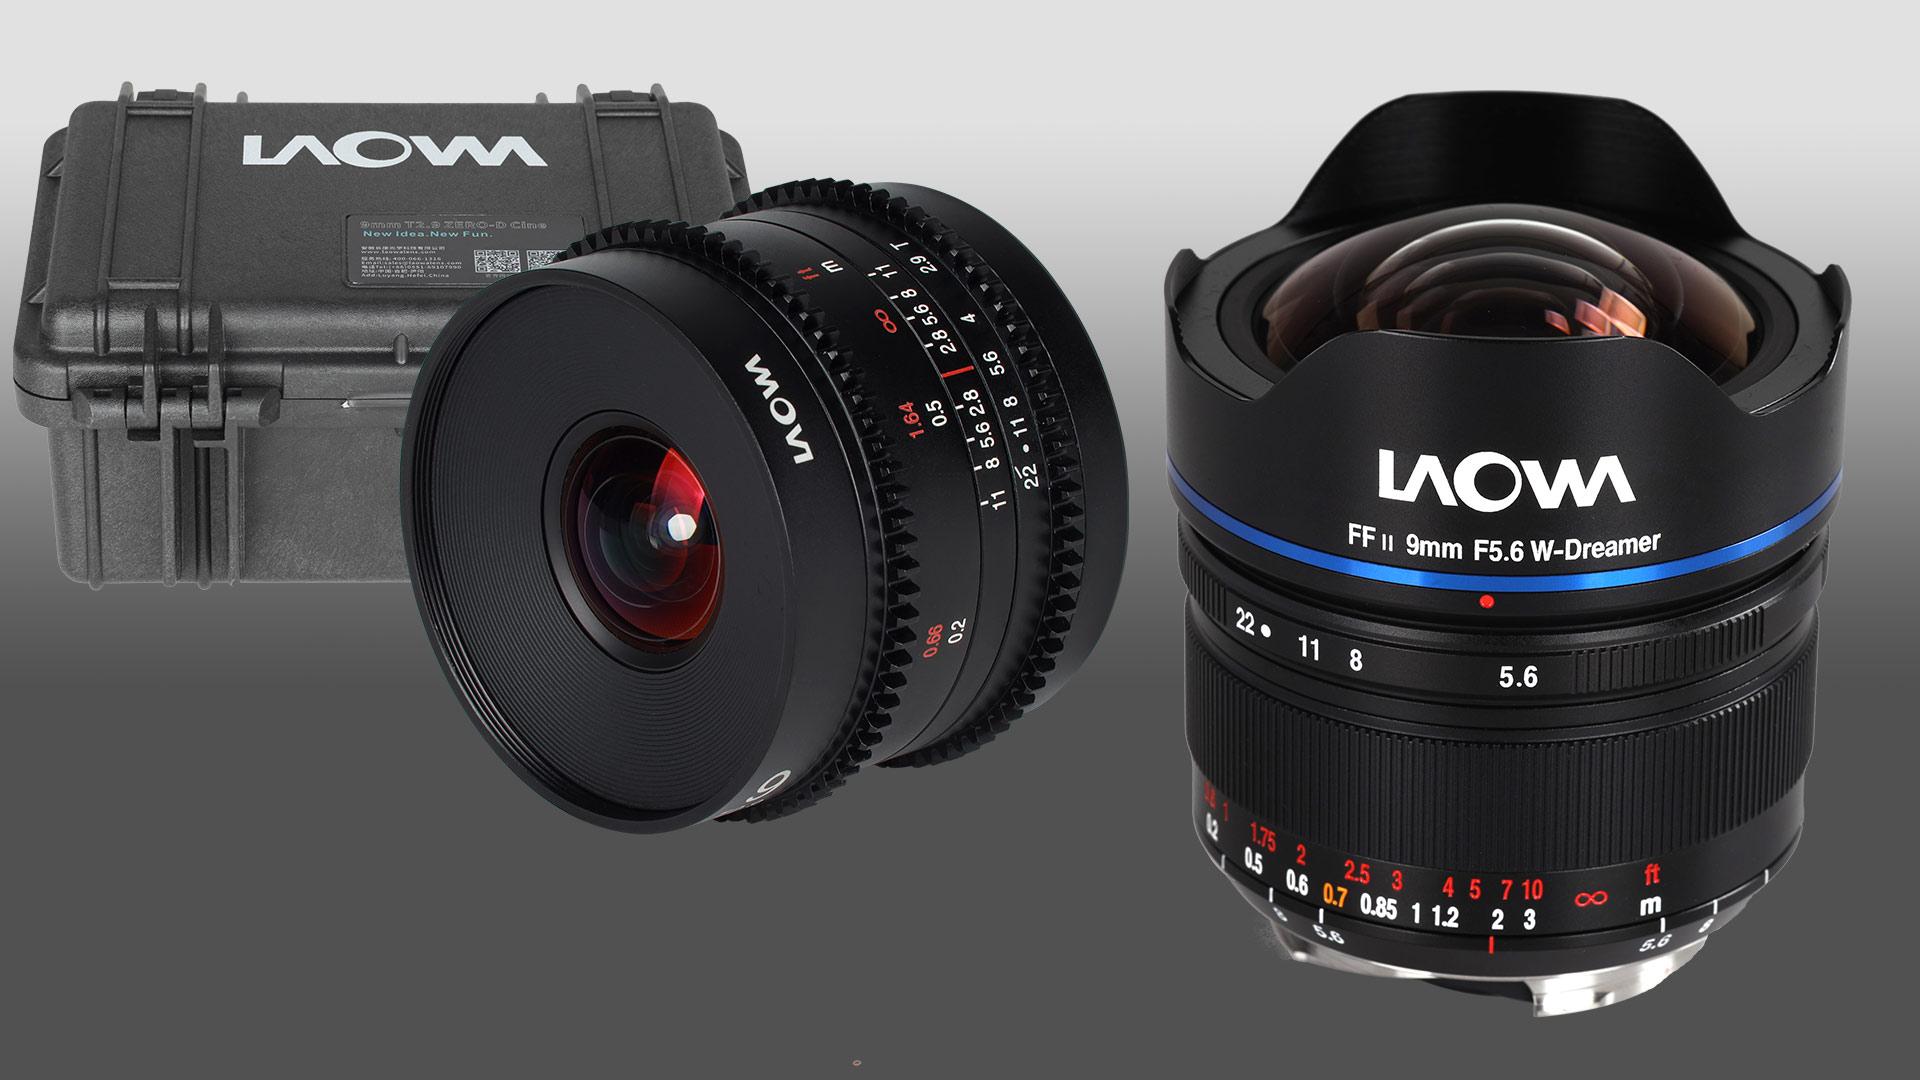 Laowaから9mm  f/5.6超広角レンズが発売